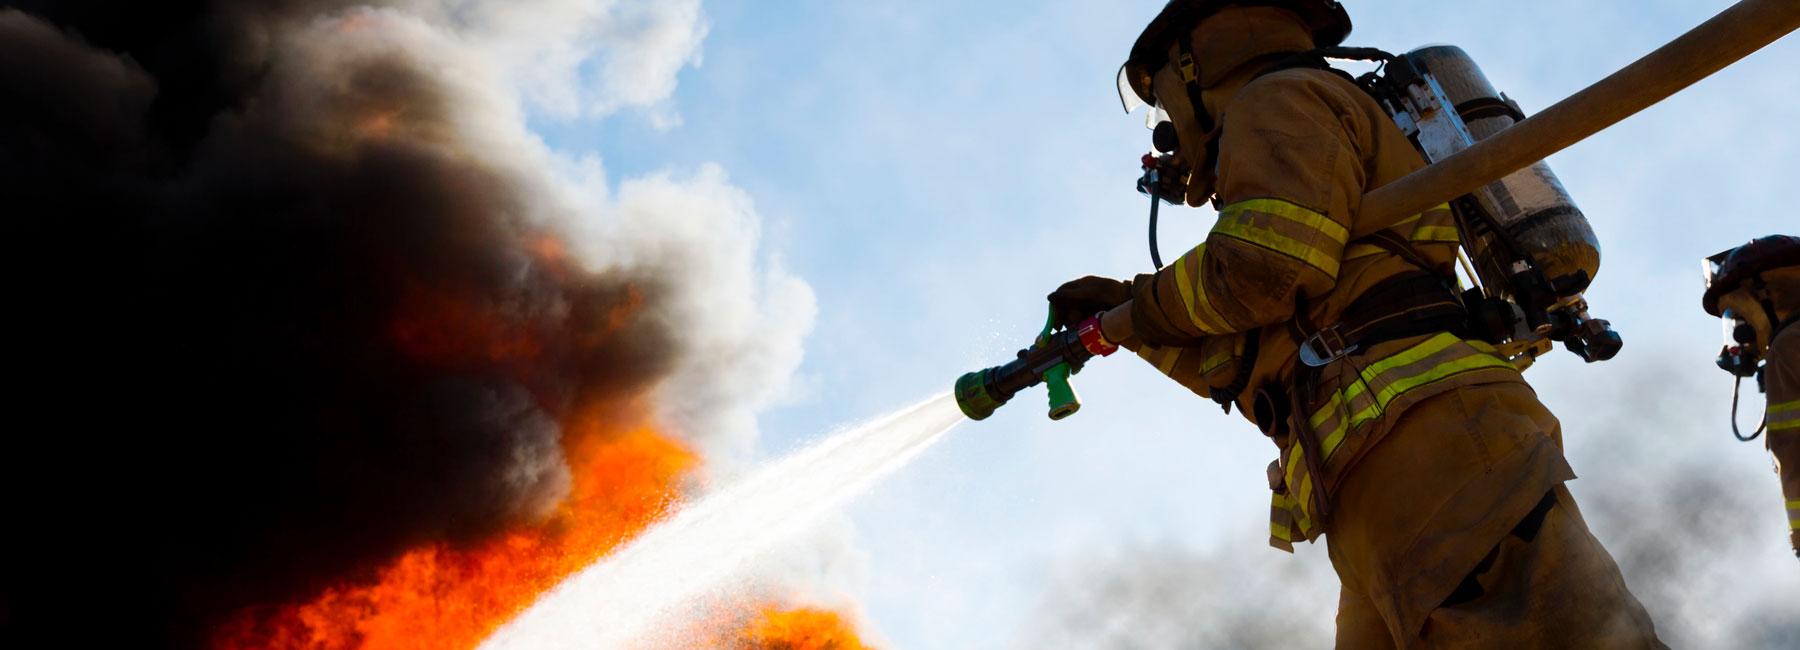 fire department risk management